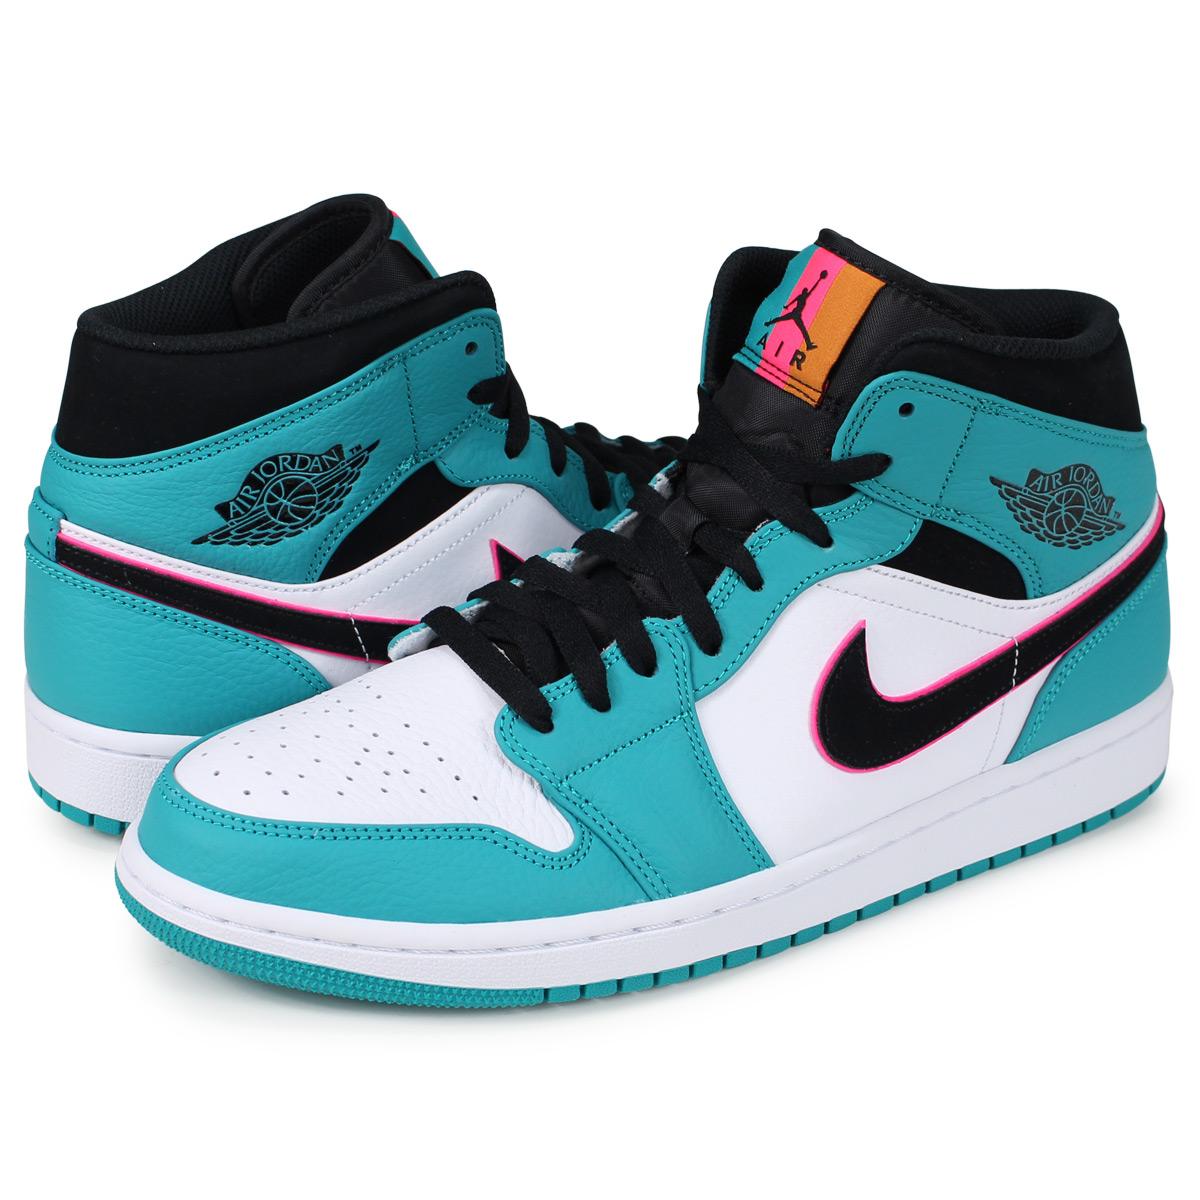 4294174bd65 [brand NIKE getting high popularity from sneakers freak]. A mid cut model  appears from AIR JORDAN 1 ...